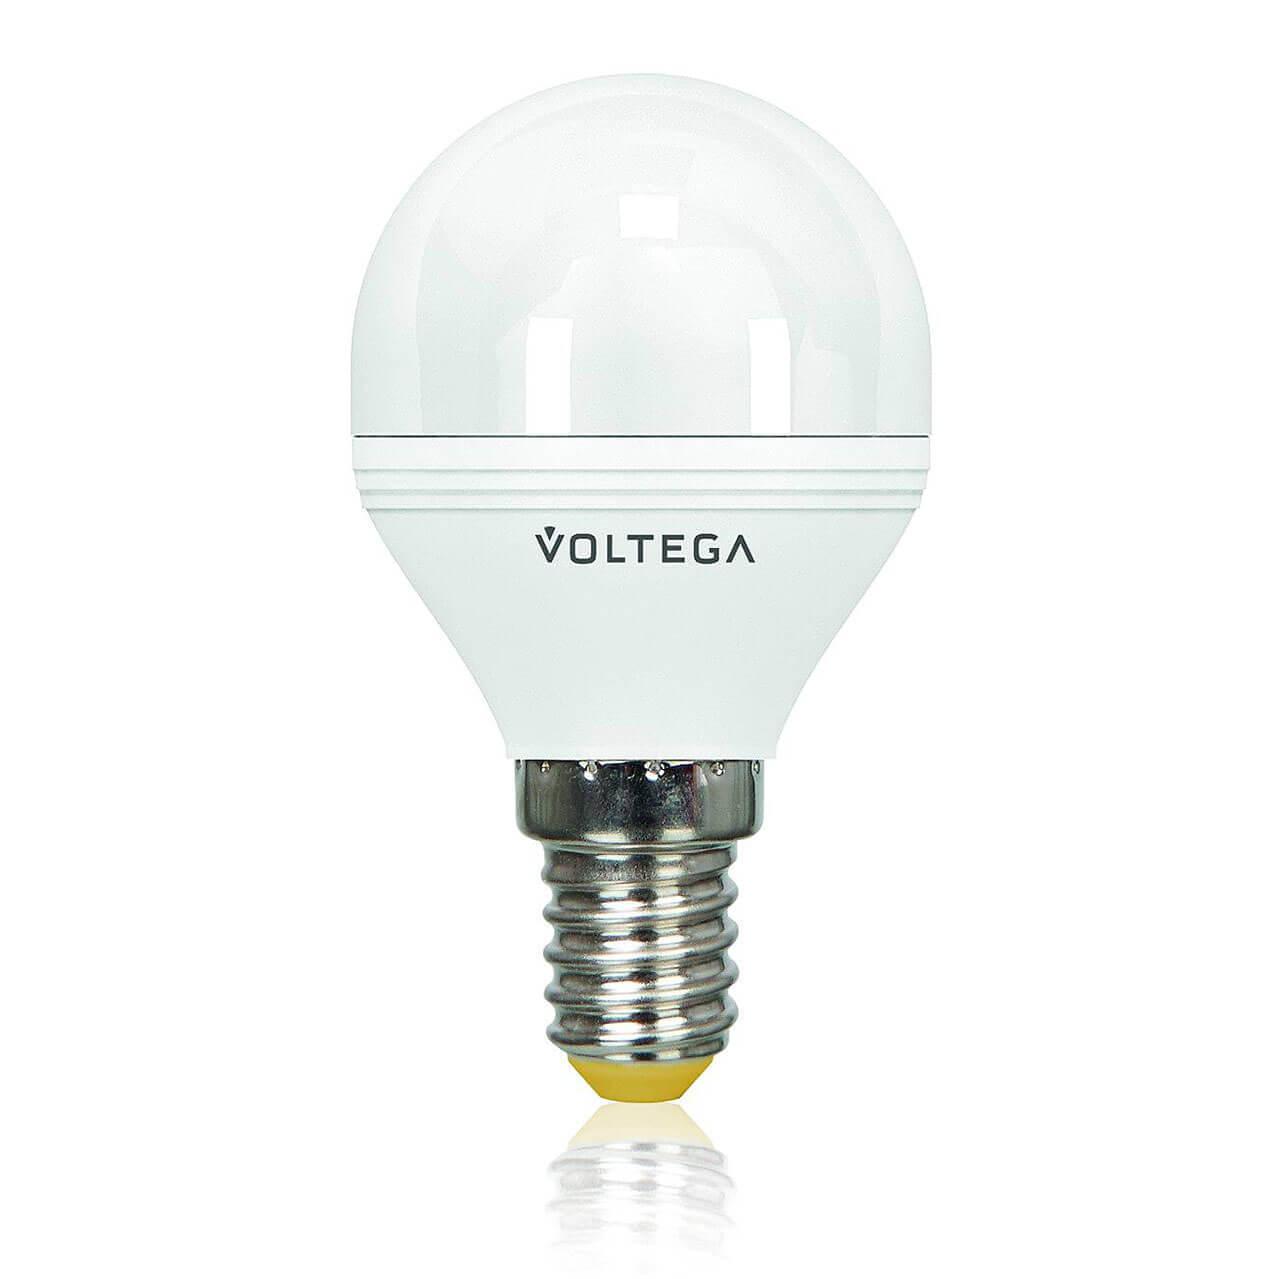 Лампа светодиодная диммируемая Voltega E14 6W 4000К матовая VG2-G2E14cold6W-D 5494 voltega лампа светодиодная voltega рефлектор матовый e14 5 4w 4000к vg4 rm2e14cold5w 5756